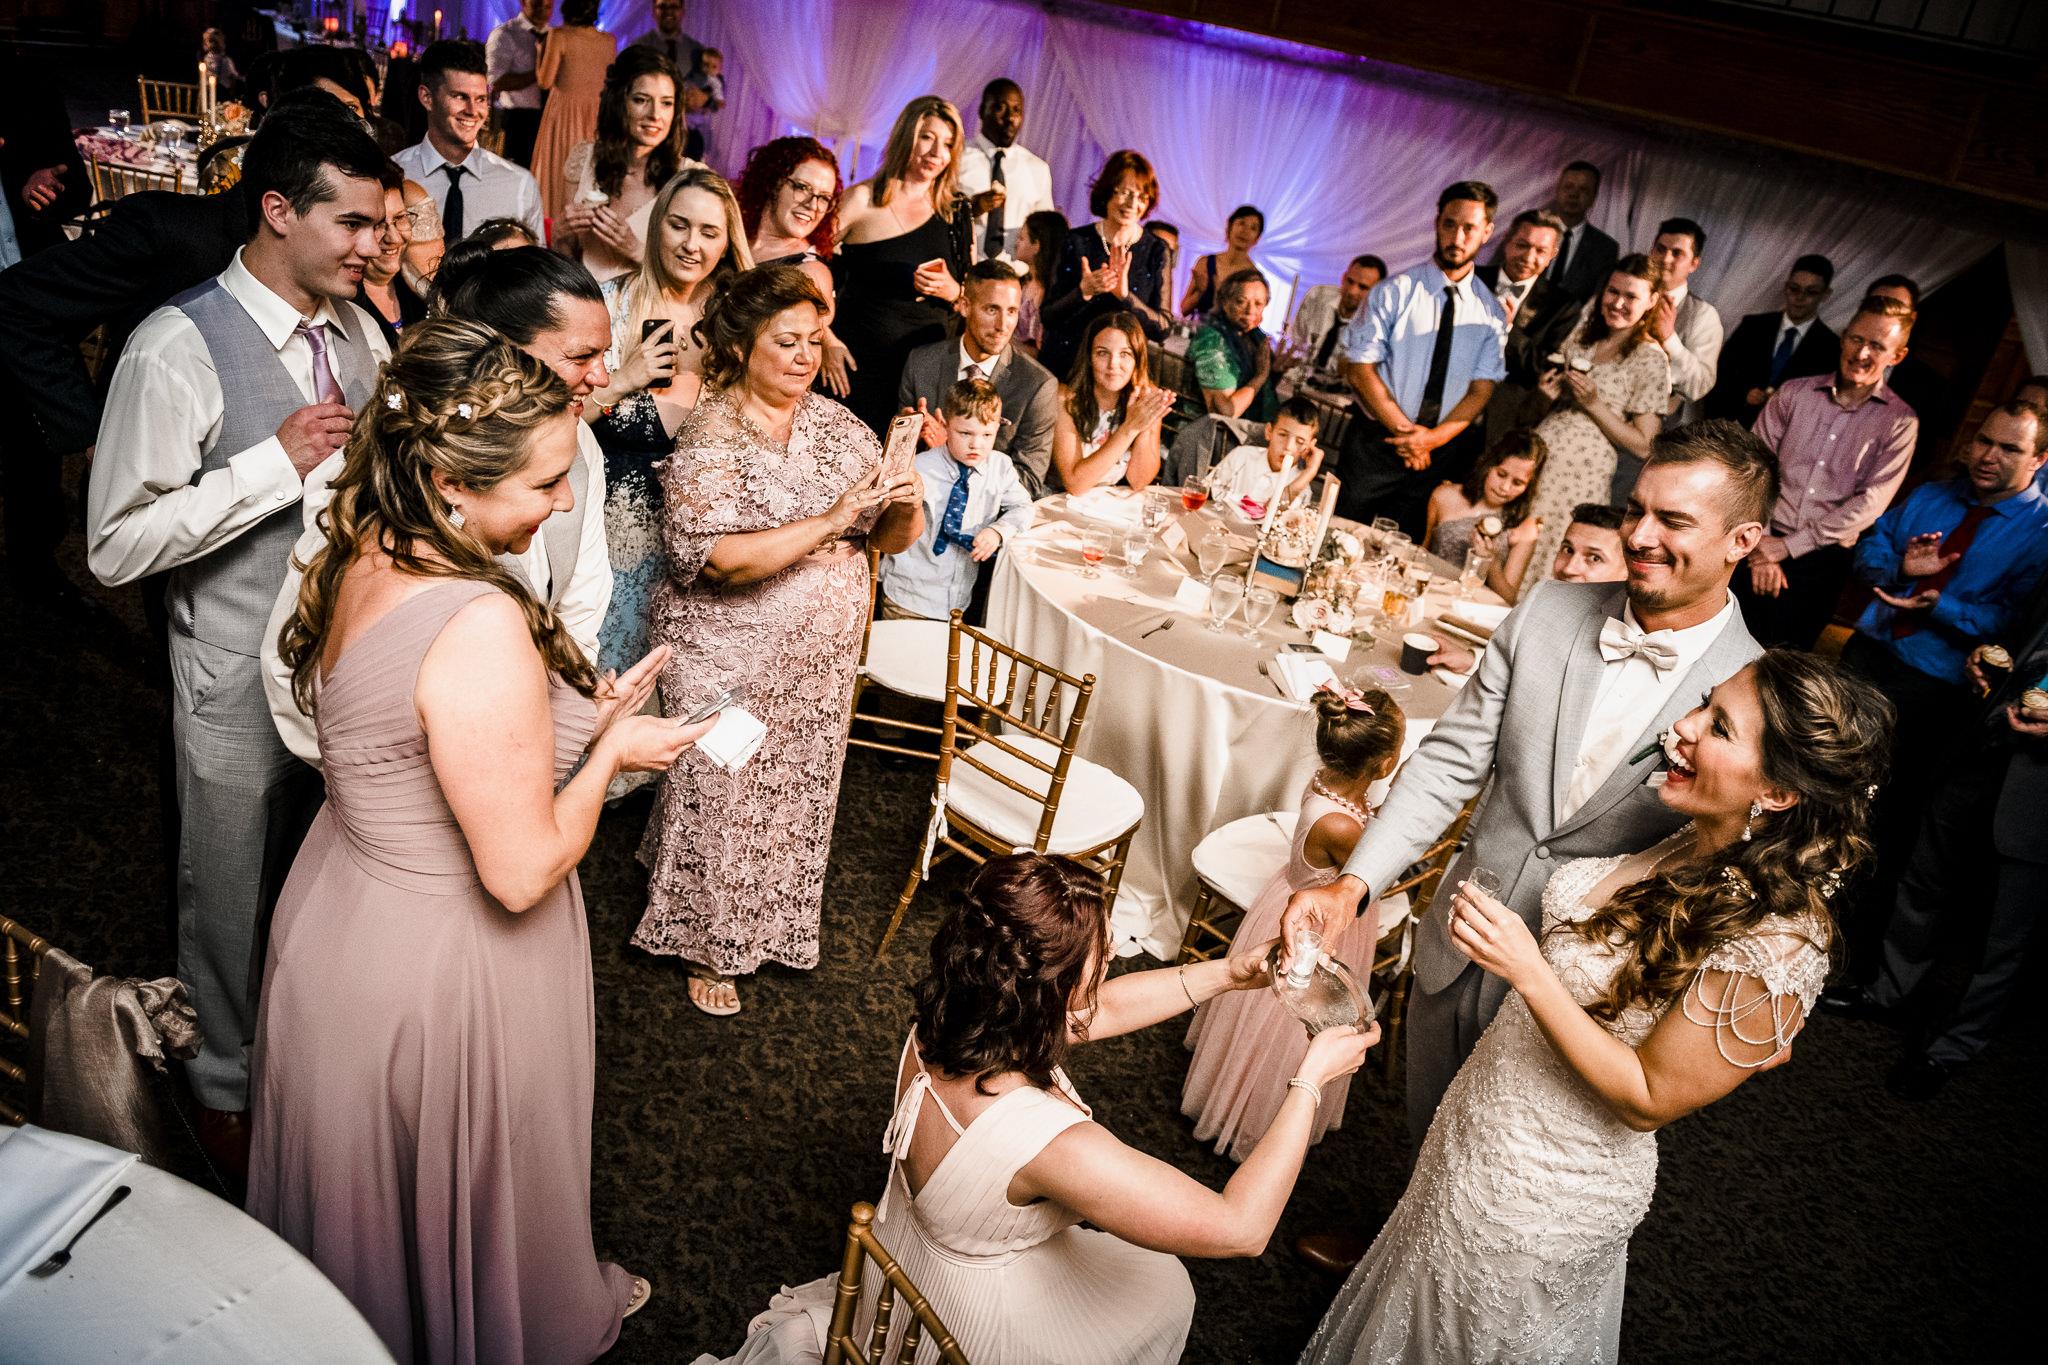 Barbato-Moorestown-Community-House-Wedding-New-Jersey-Photographer-37.JPG